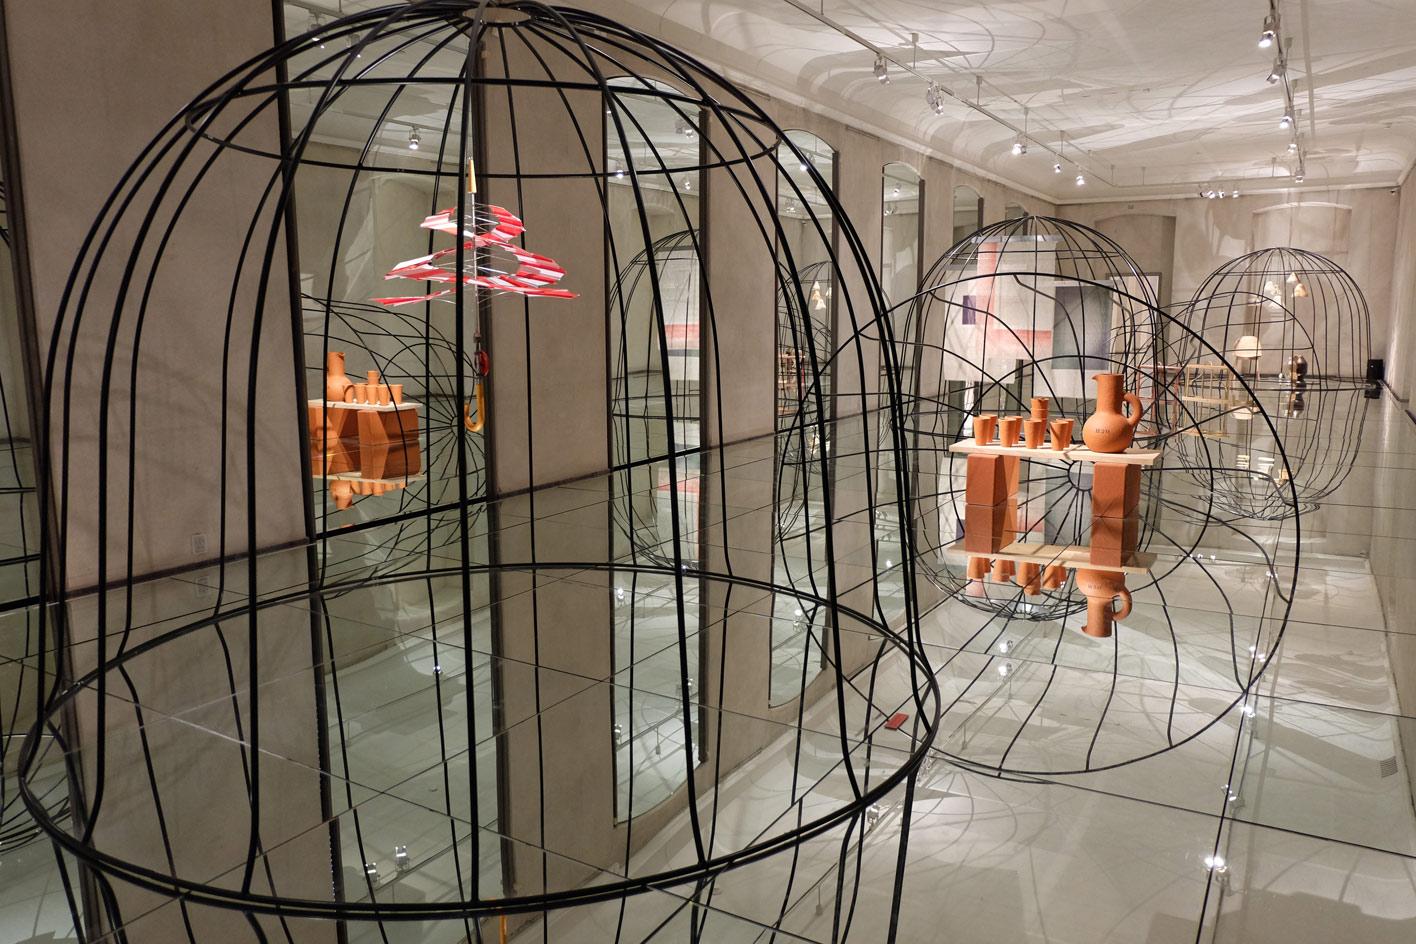 Mirrored floors at the Danish Design Museum